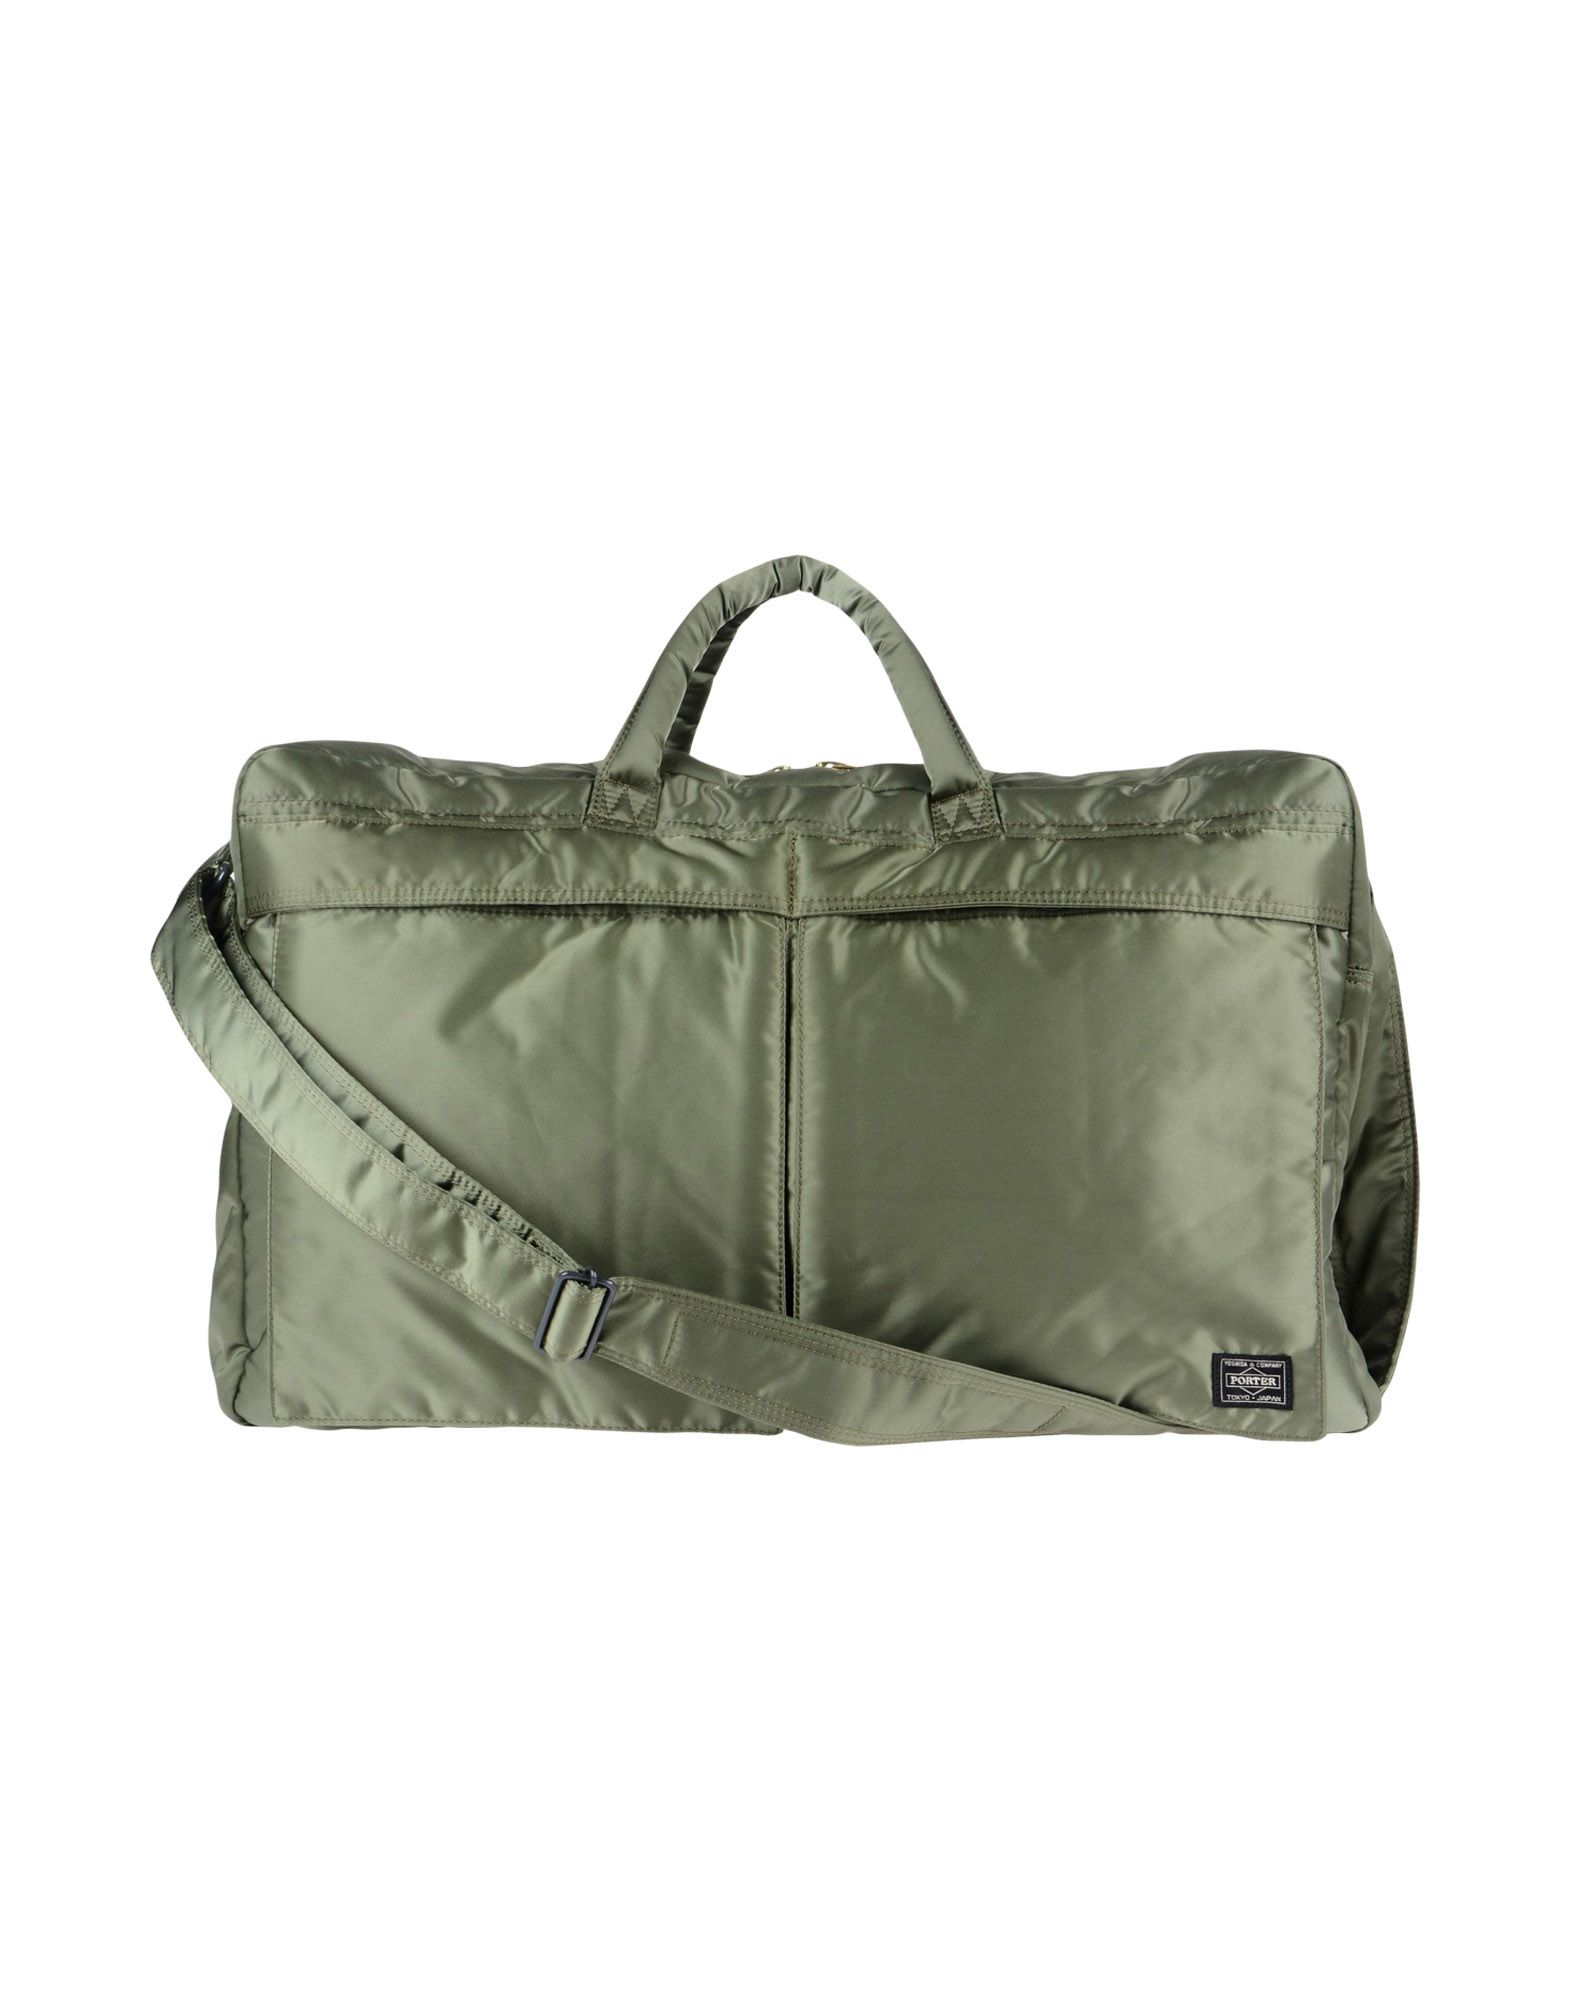 083d801b1768 Porter By Yoshida   Co Work Bags - Porter By Yoshida   Co Men - YOOX United  Kingdom